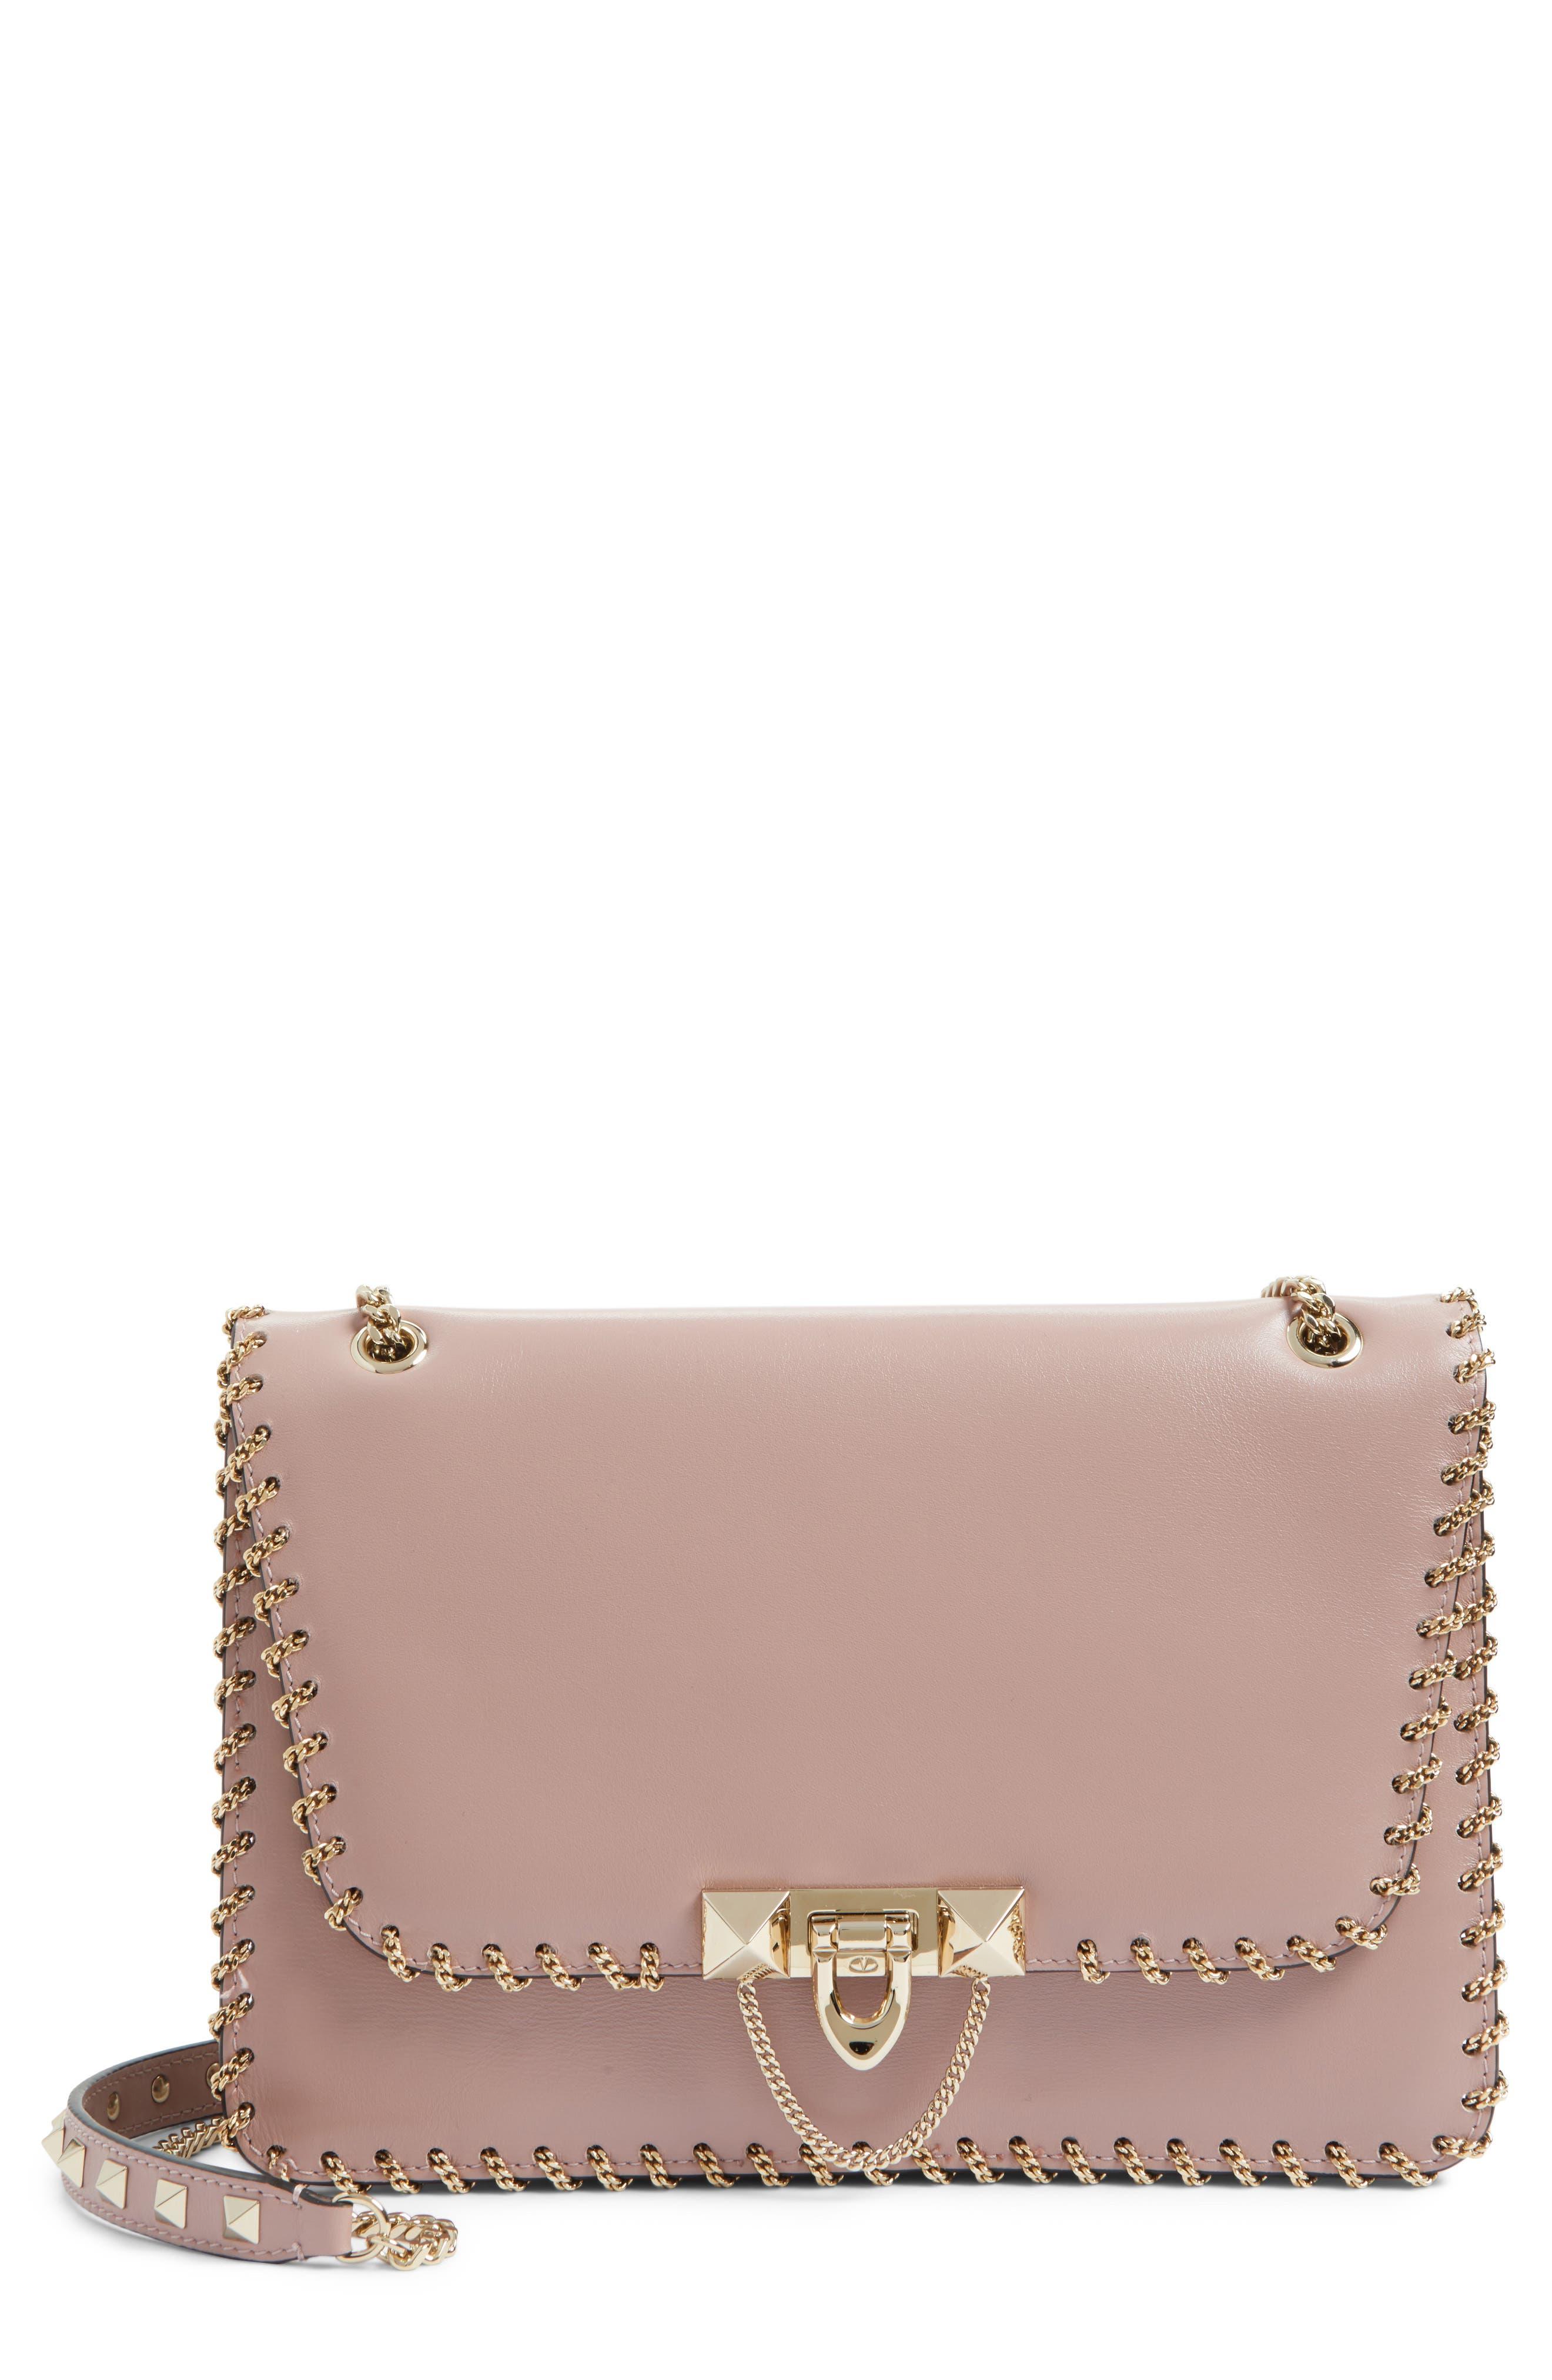 Demilune Whipstitch Leather Shoulder Bag,                             Main thumbnail 1, color,                             Lipstick